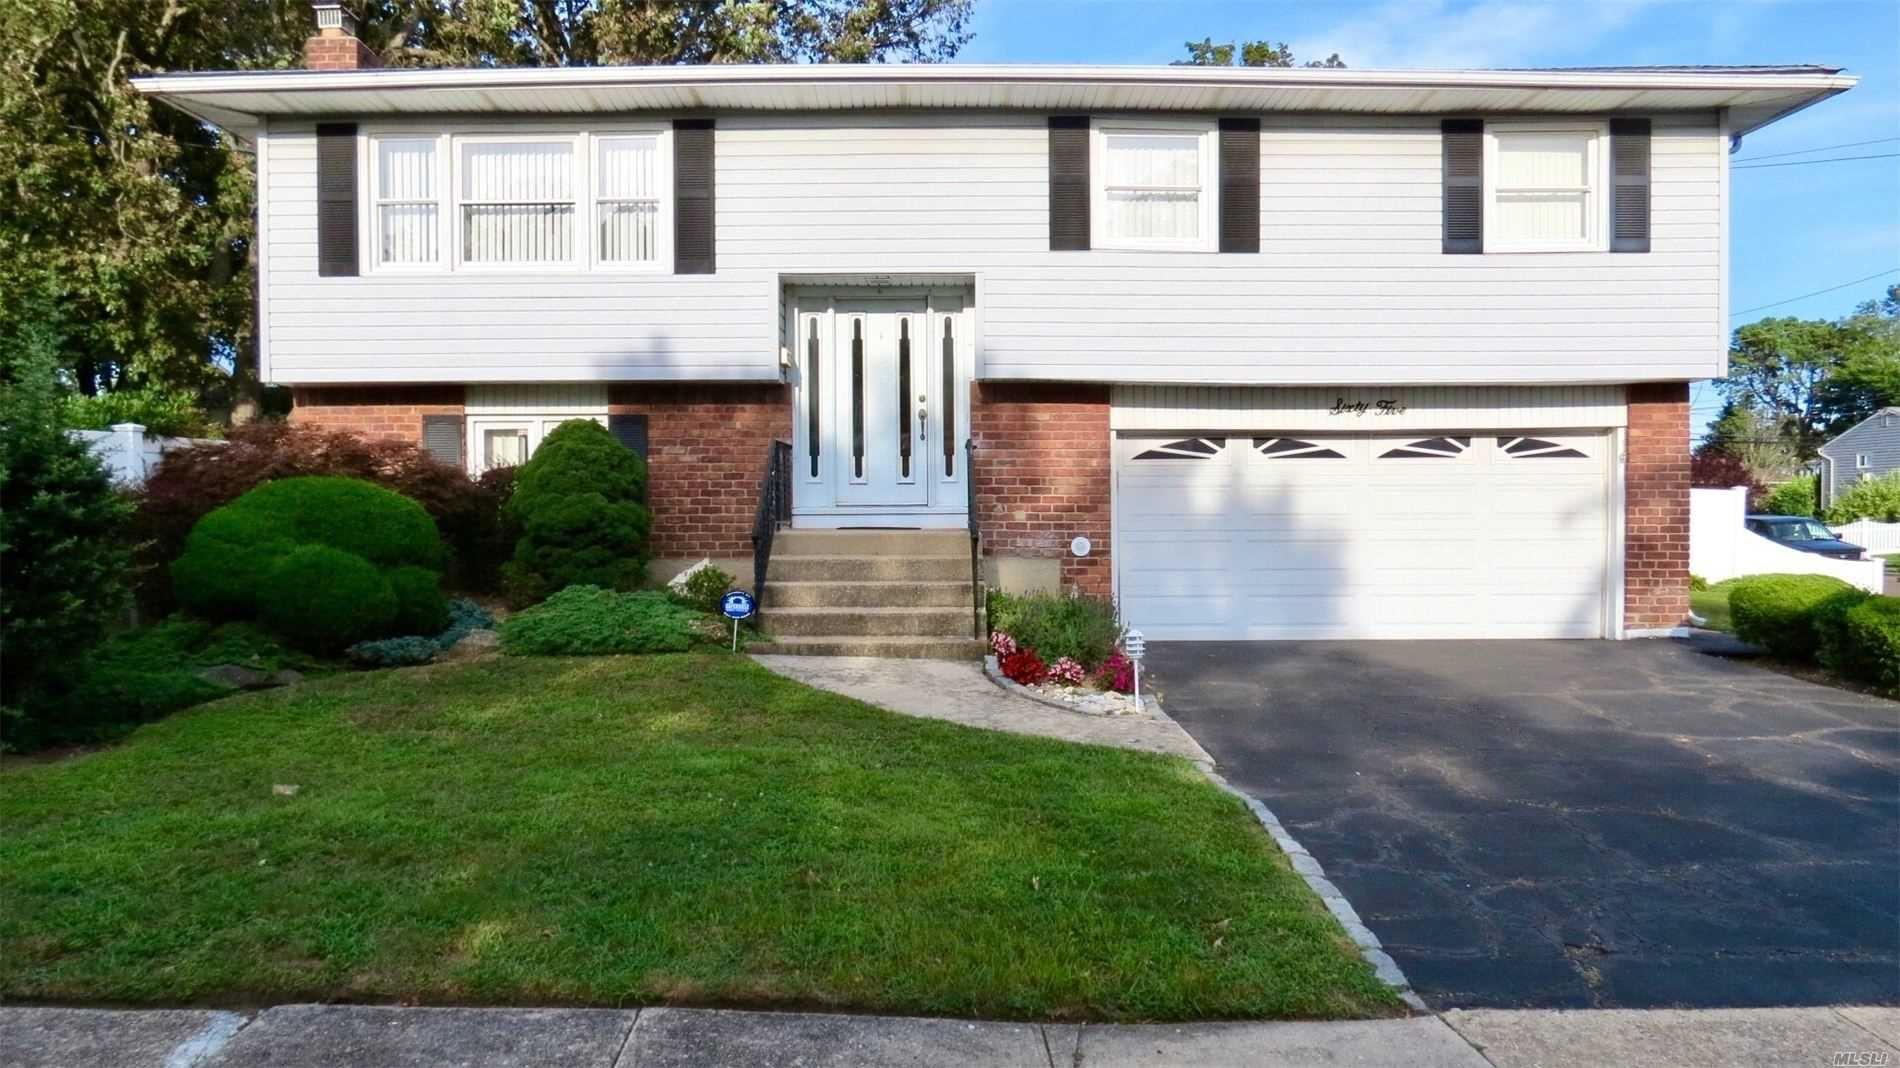 65 Elm Drive, Farmingdale, NY 11735 - MLS#: 3247040